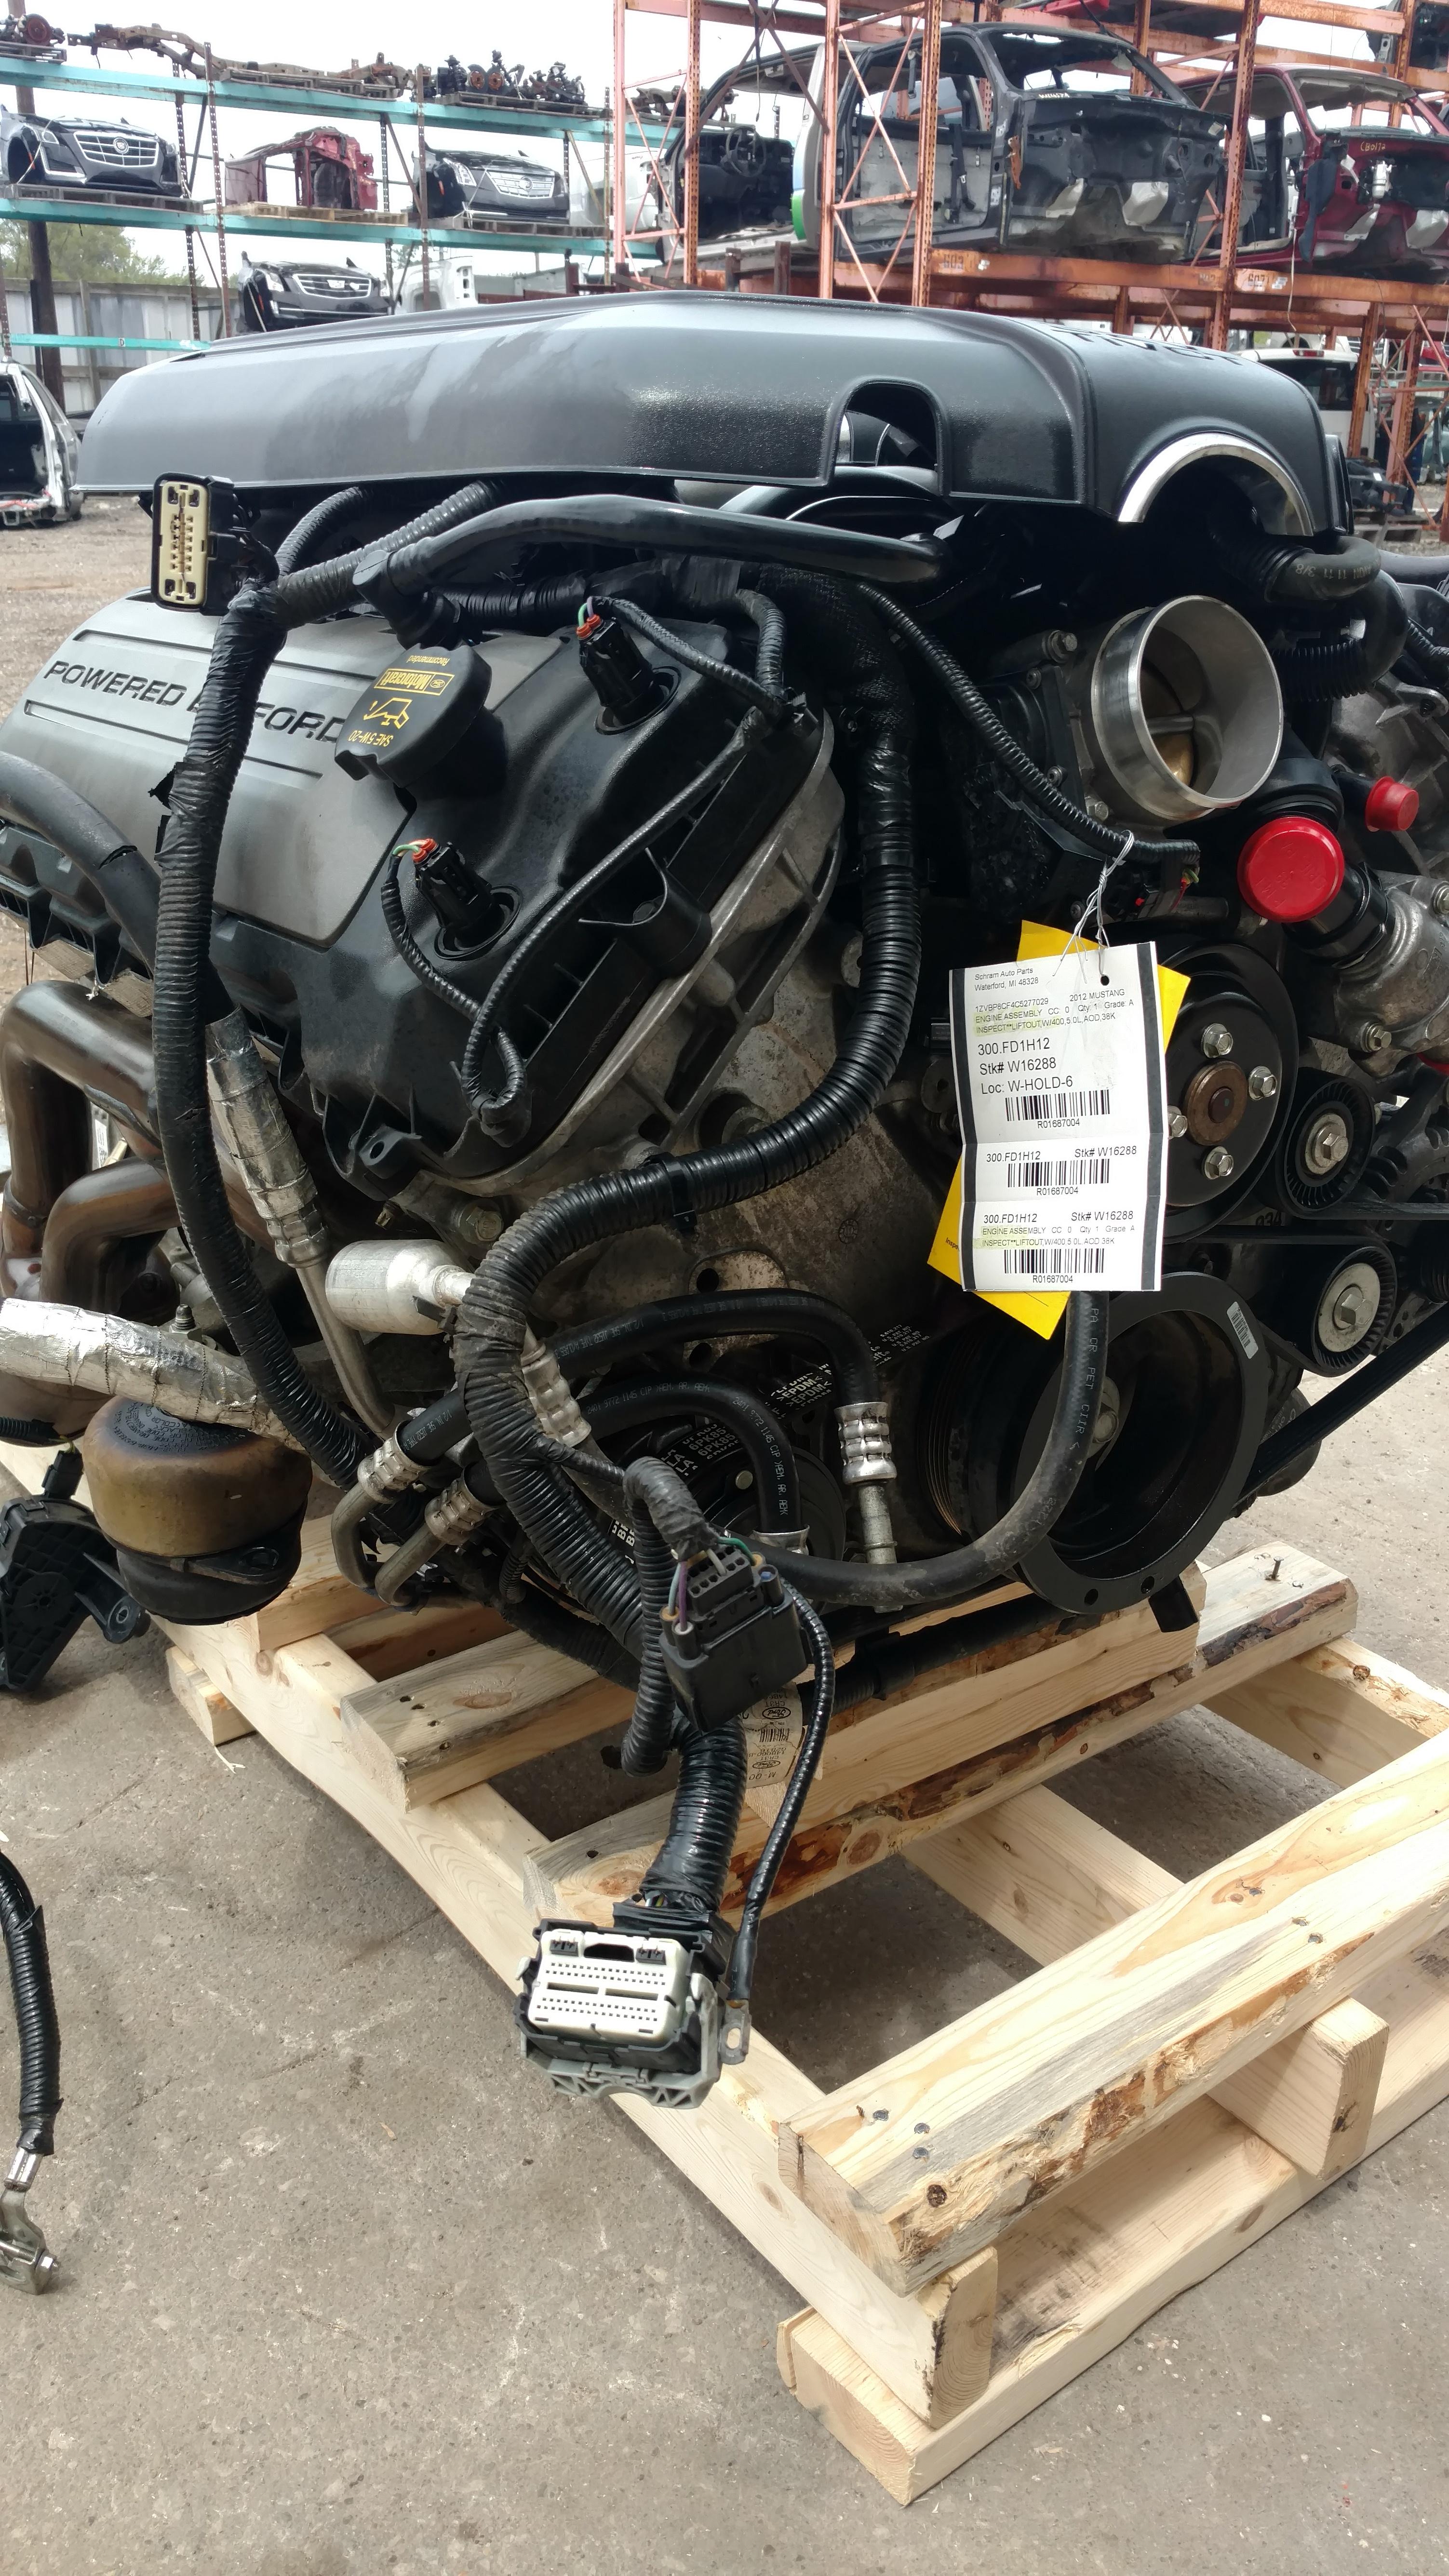 2013 ford mustang 5 0l coyote engine transmission lift out project motor ebay. Black Bedroom Furniture Sets. Home Design Ideas